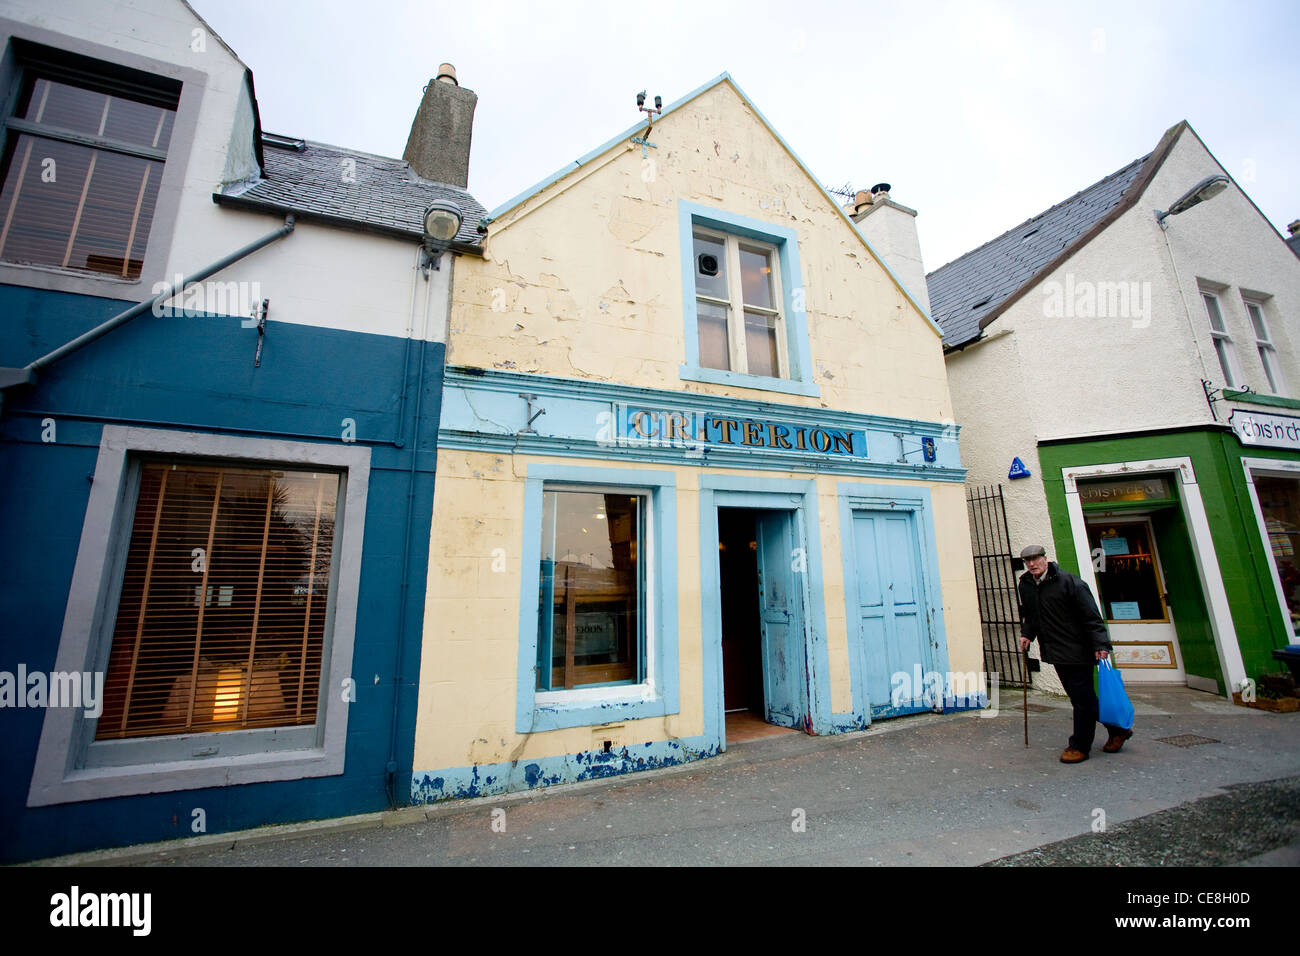 Criterion Bar, Stornoway, Isle of Lewis, Outer Hebrides, Scotland. - Stock Image